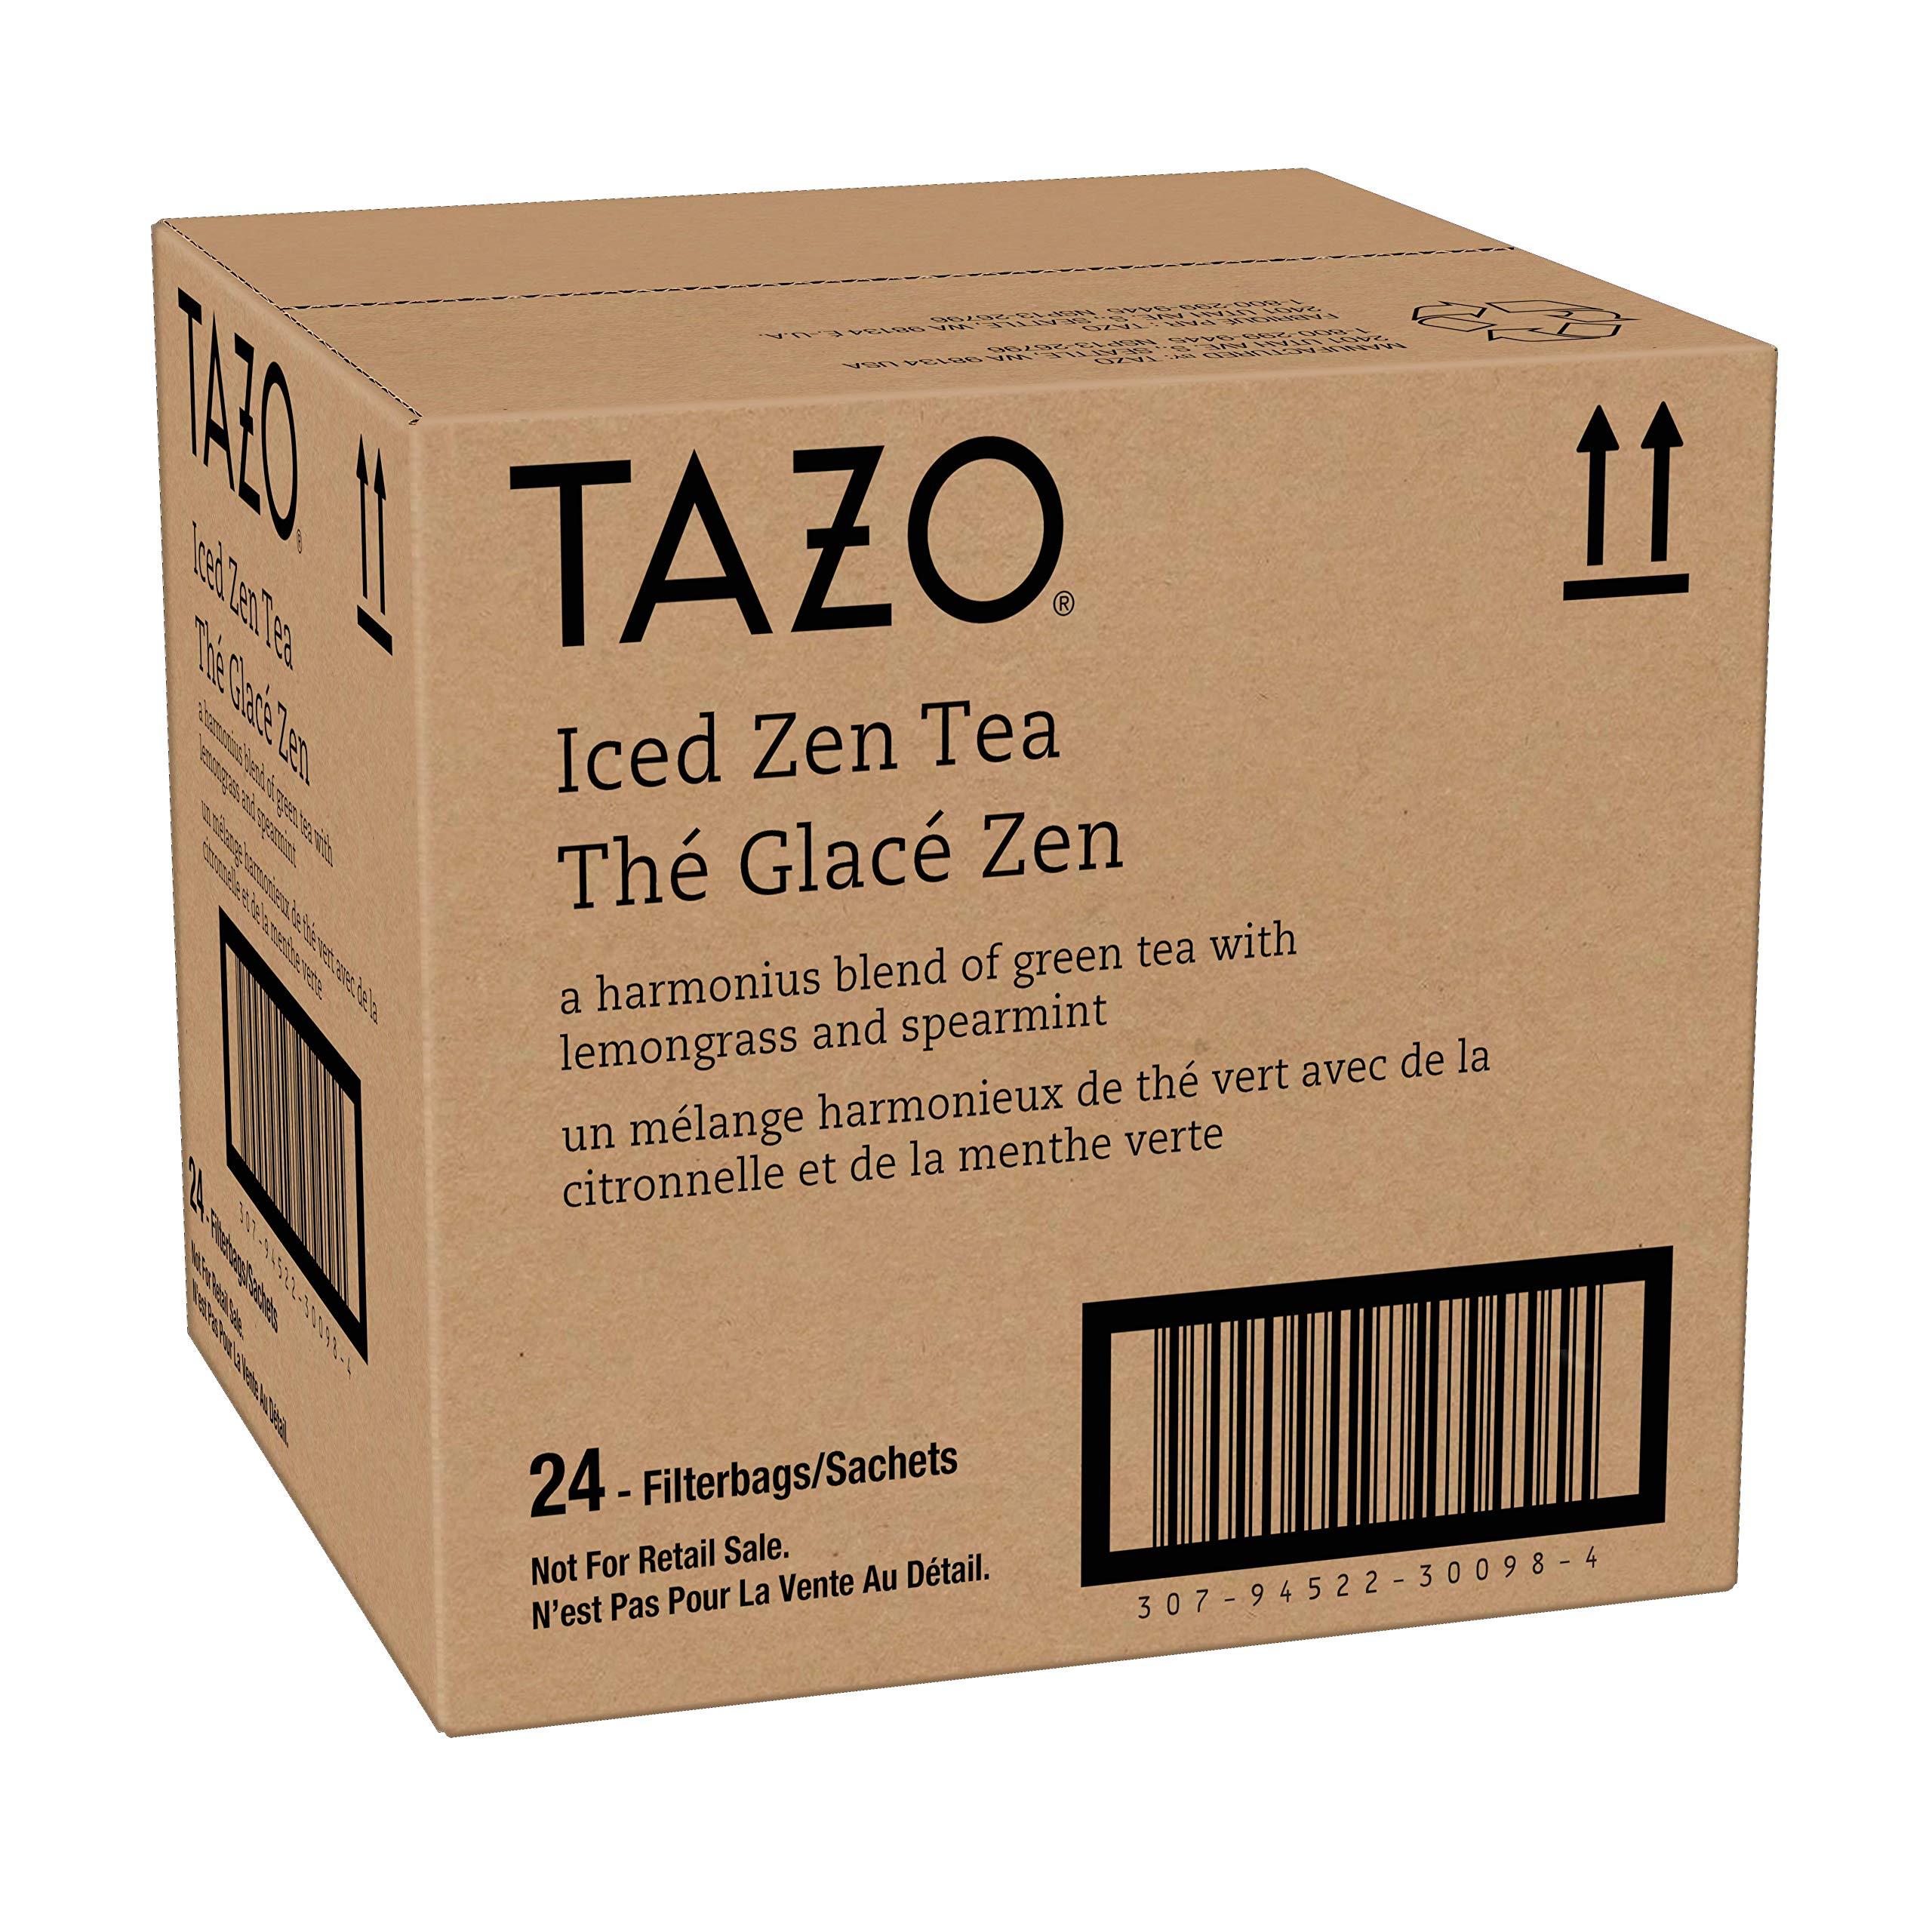 Tazo Zen Green Unsweetened Fresh Brewed Iced Tea Non GMO, 1 gallon, Pack of 24 by TAZO (Image #4)